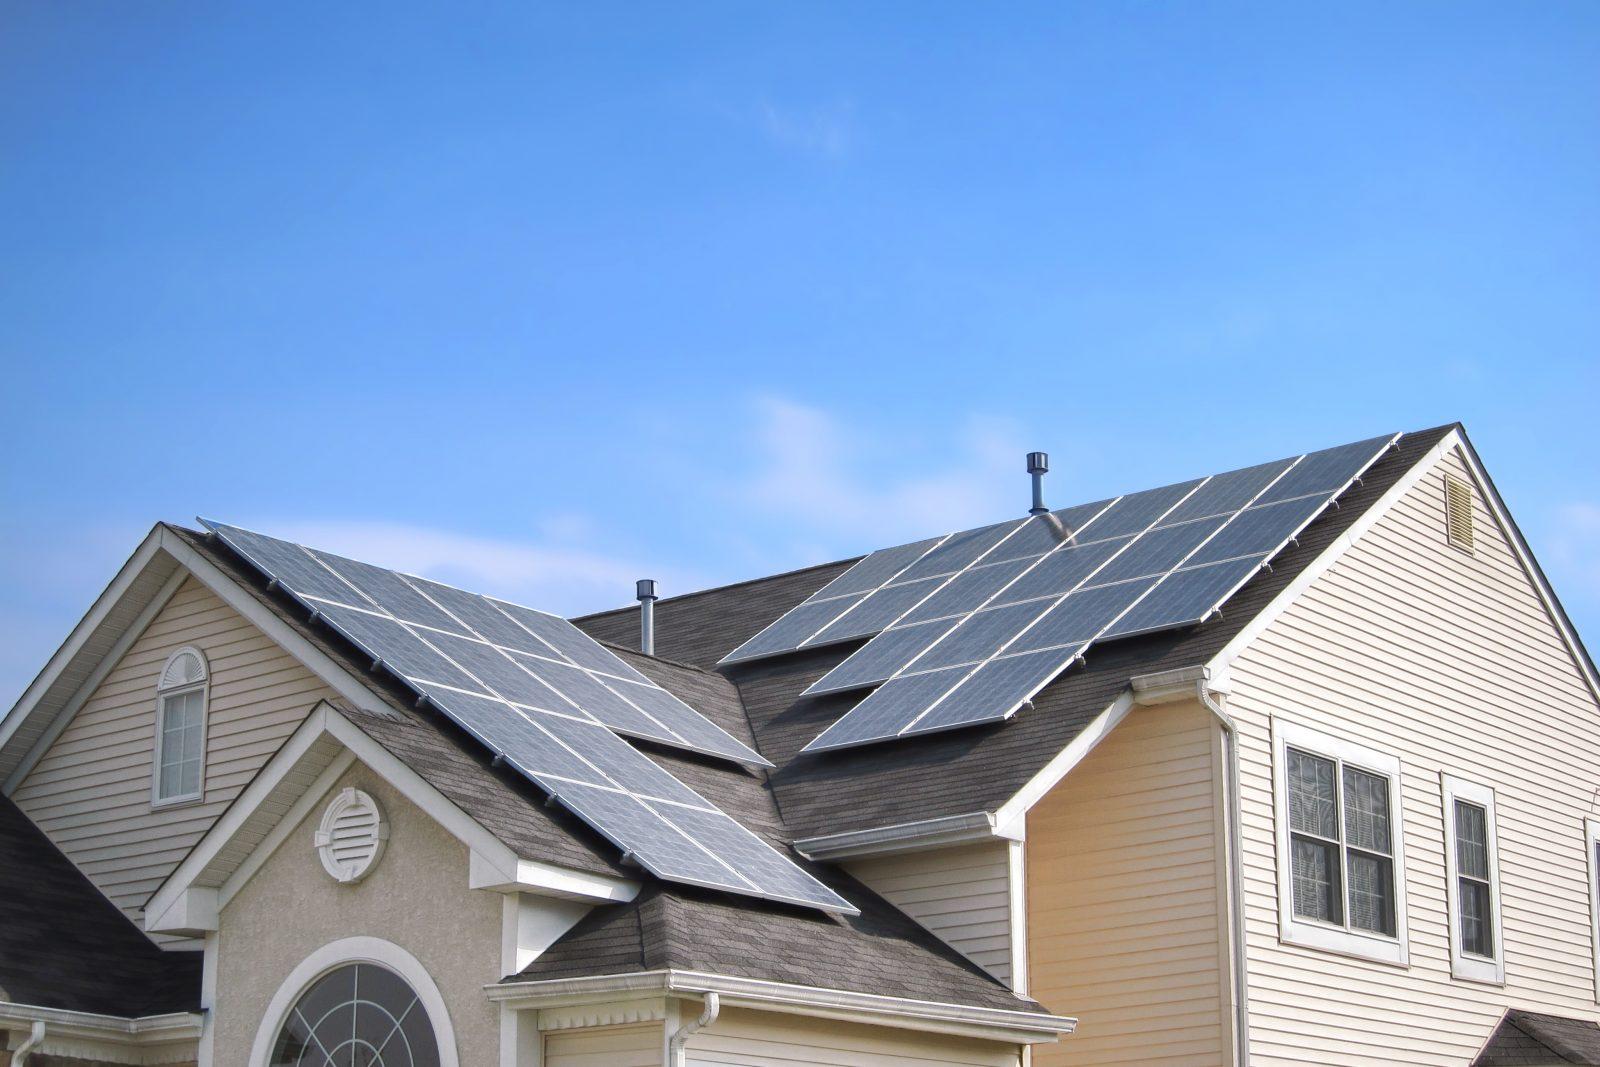 10 Home Solar Myths Debunked